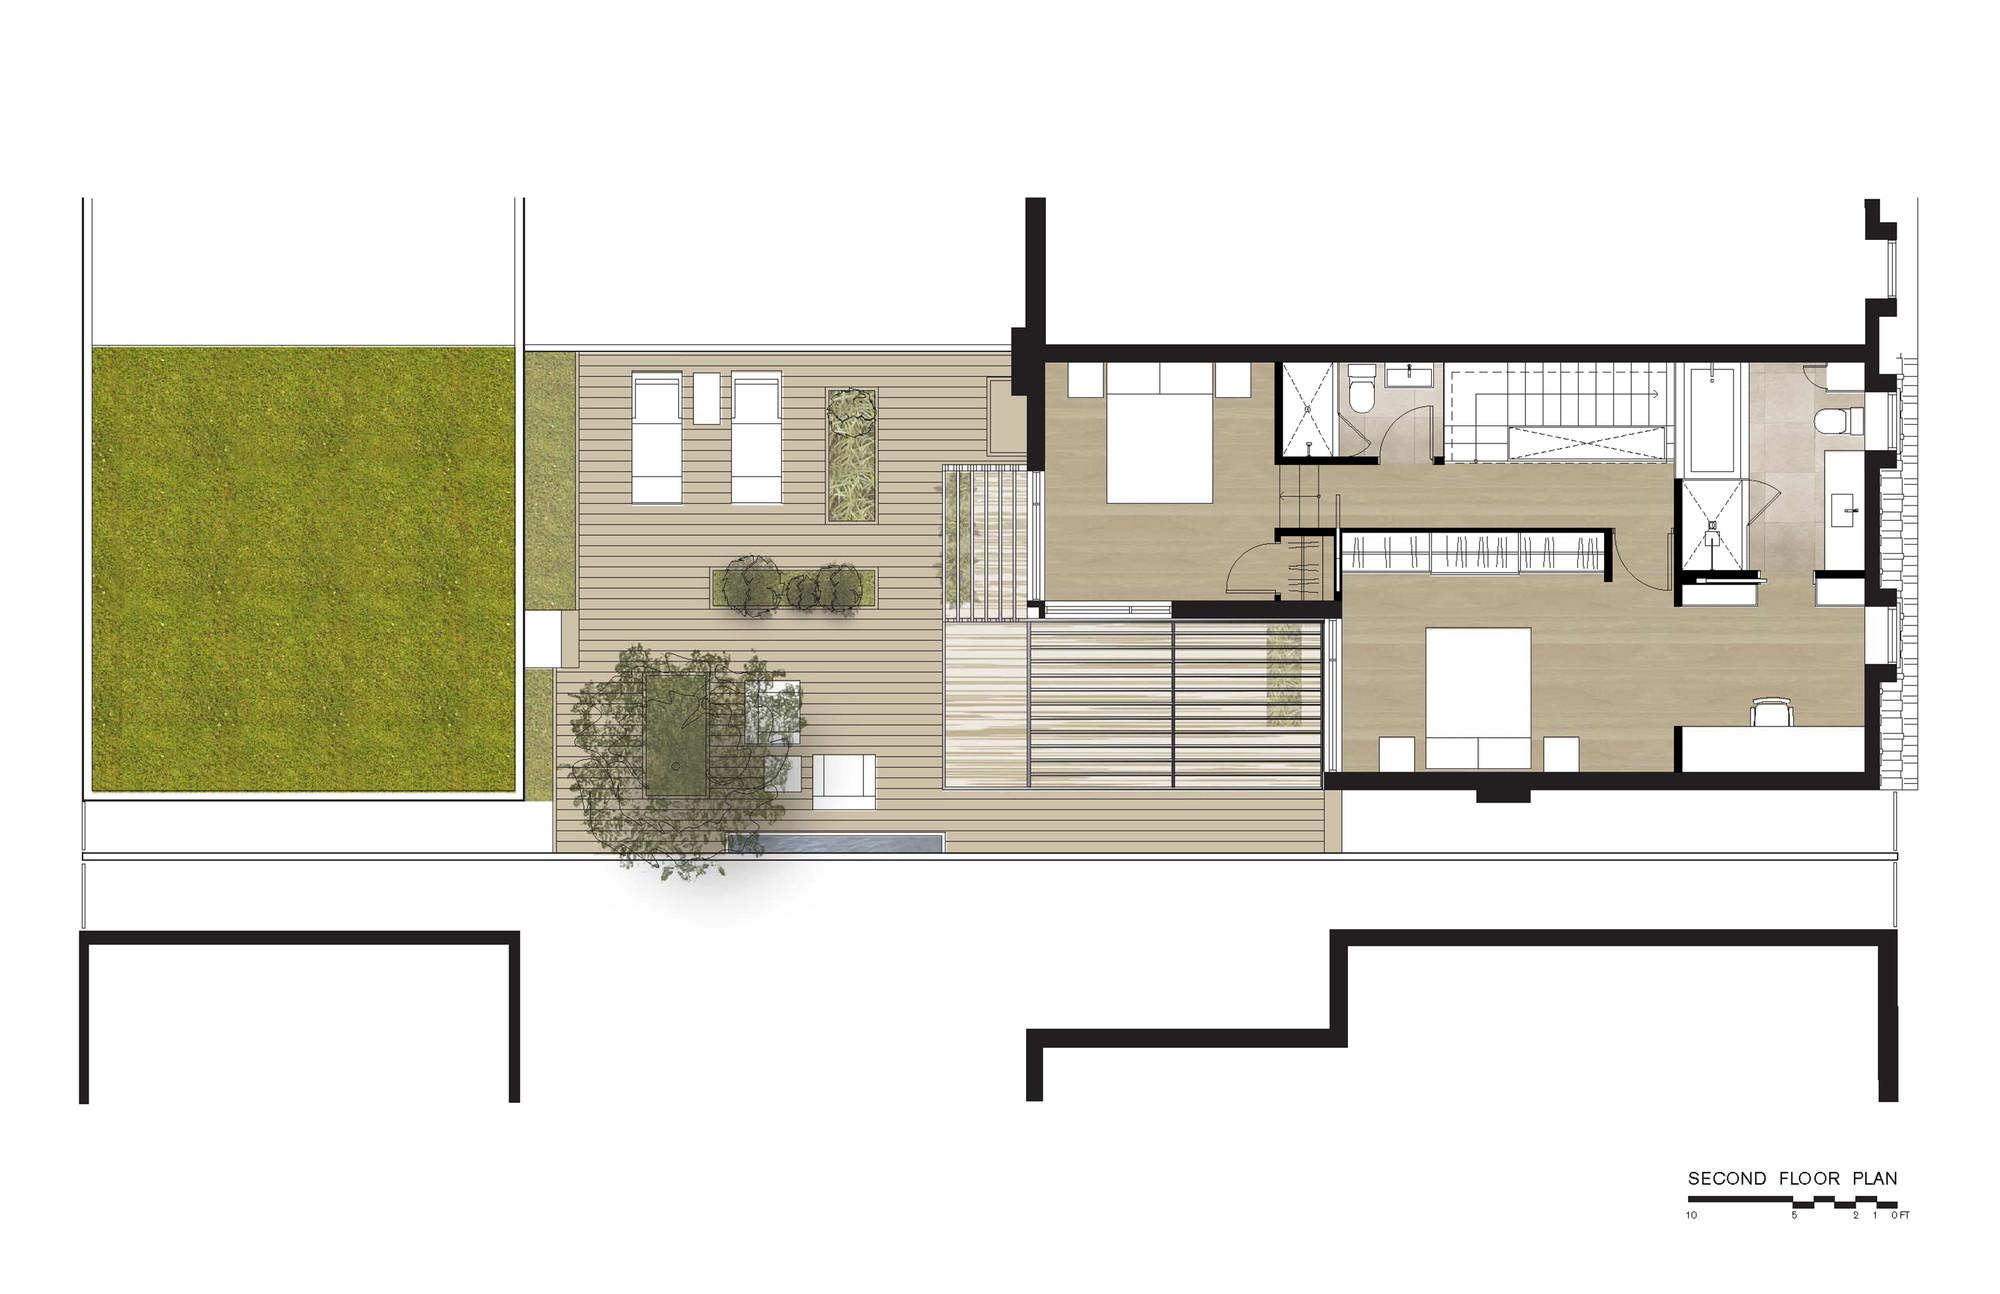 Wonderful Design For House Plan #1: Second_floor_plan.jpg?1425004152